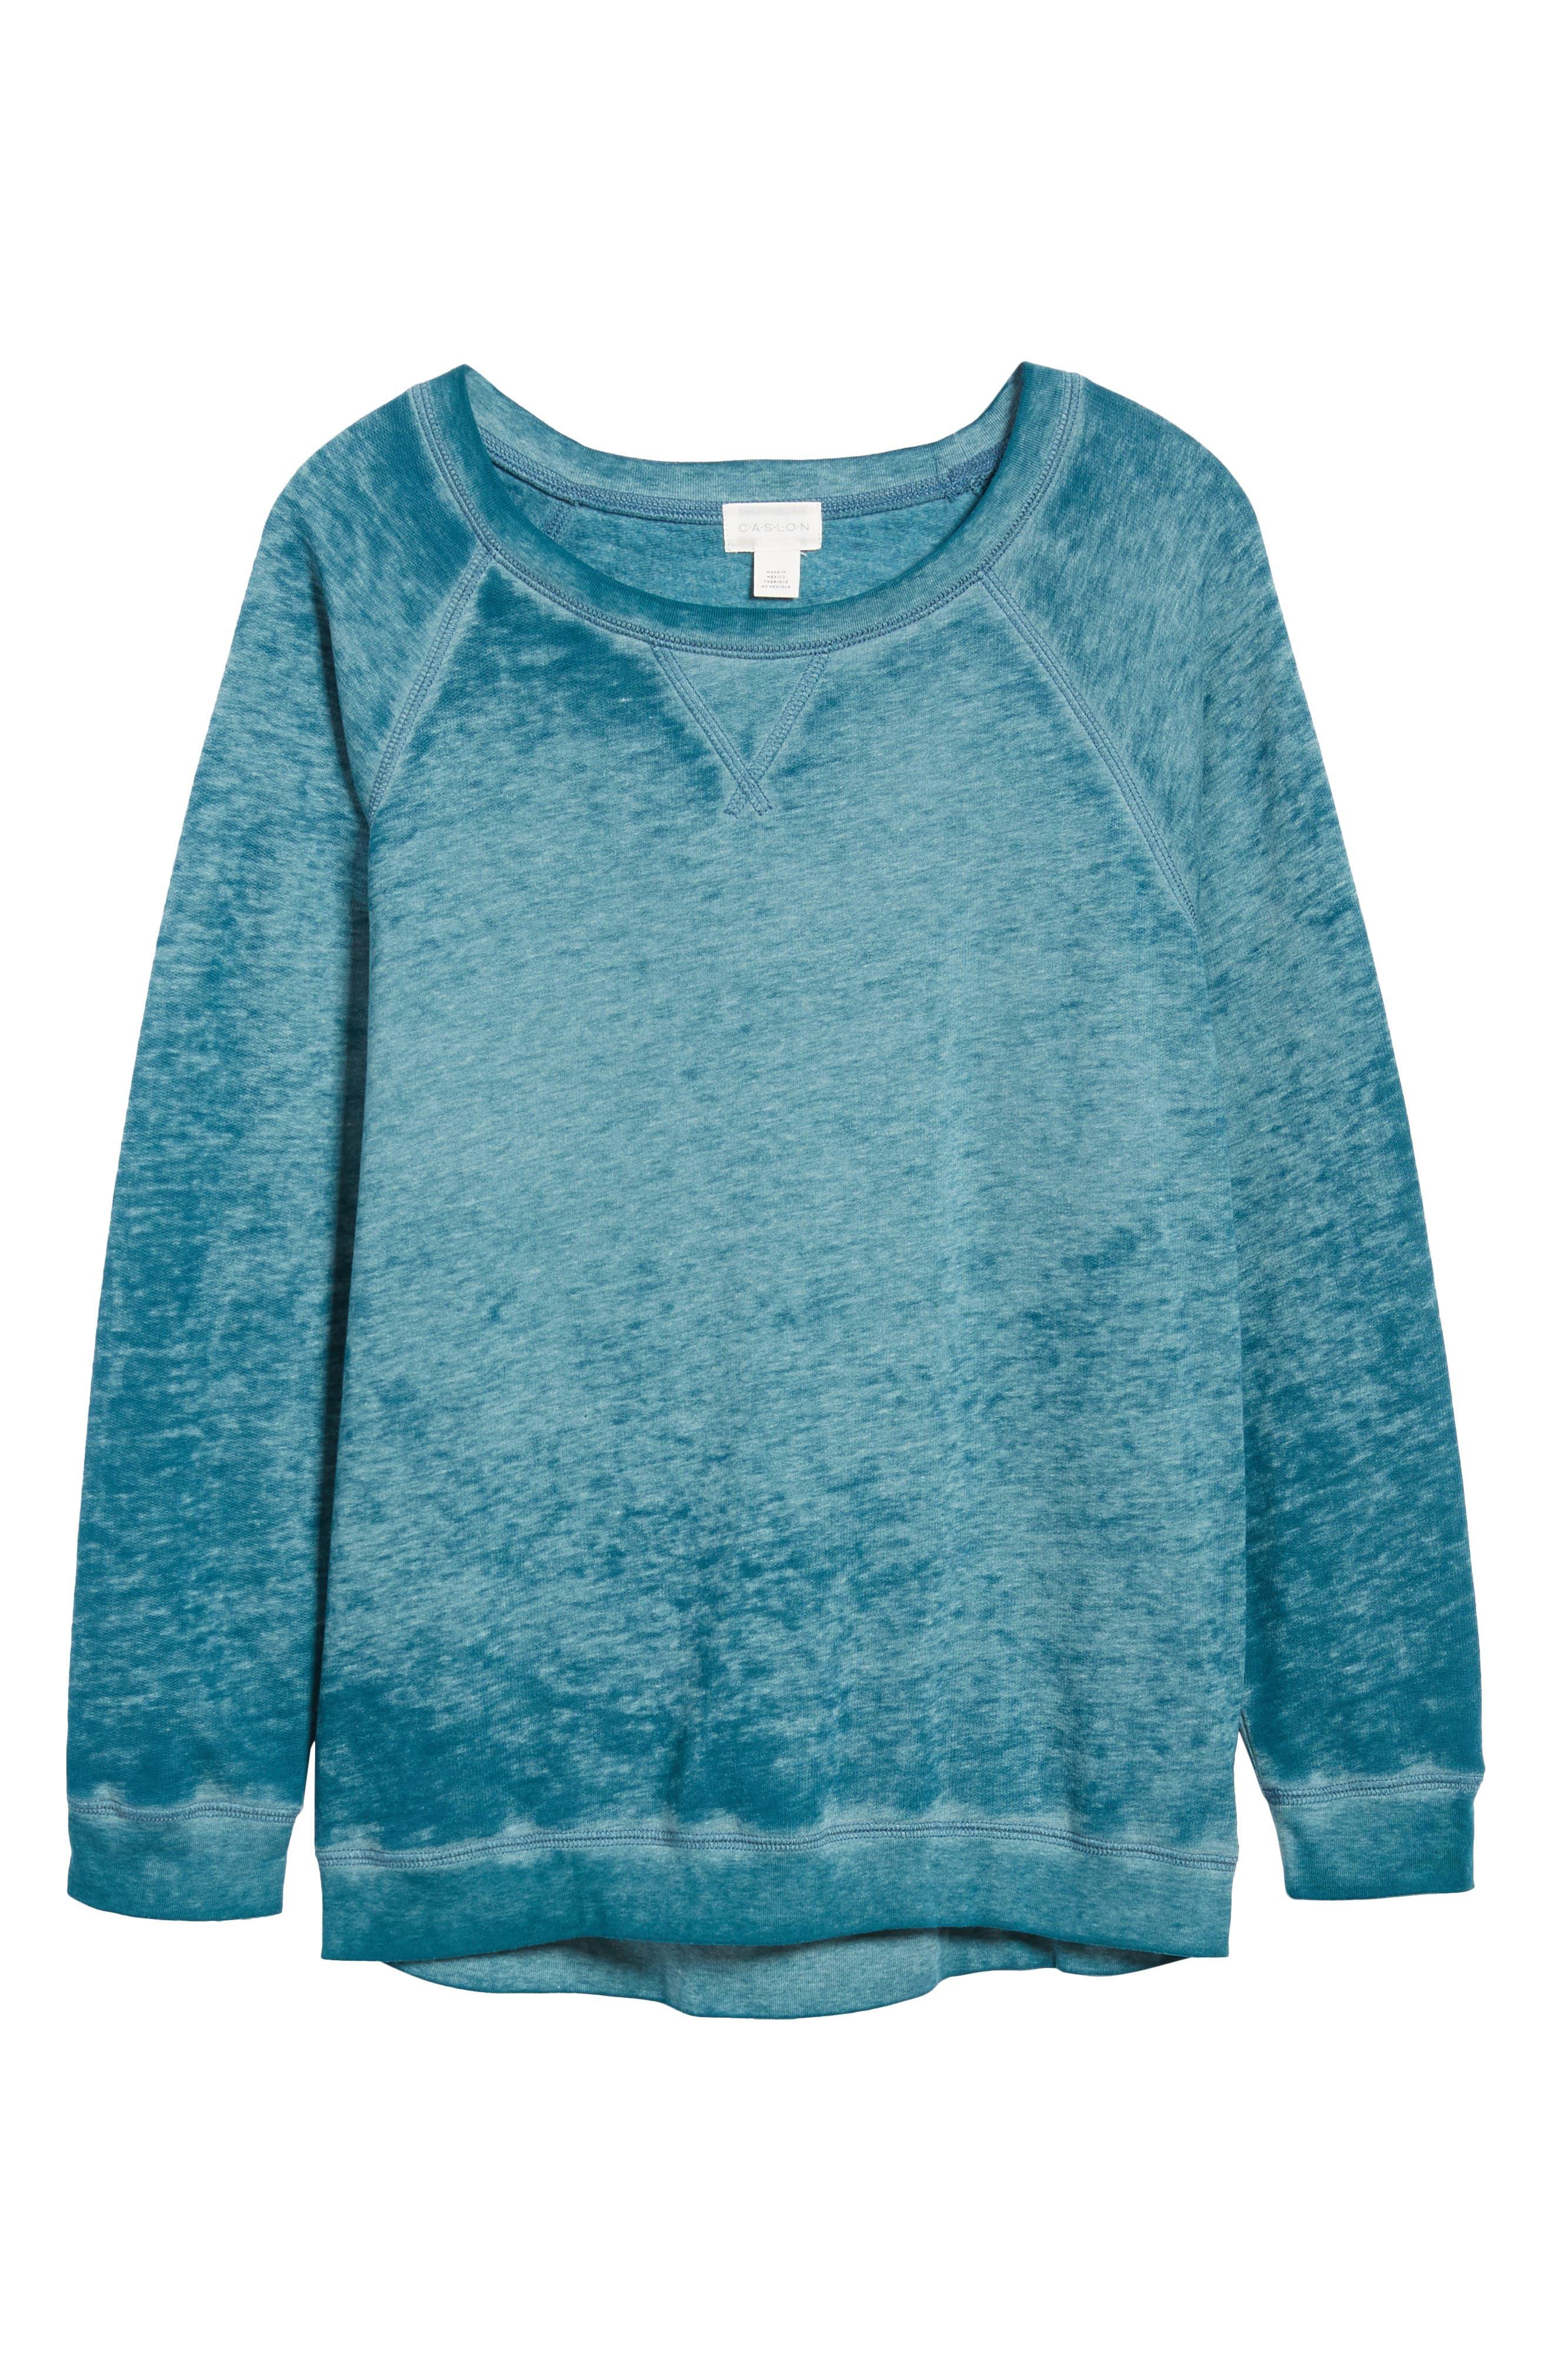 Burnout Sweatshirt,                             Alternate thumbnail 6, color,                             TEAL CORAL